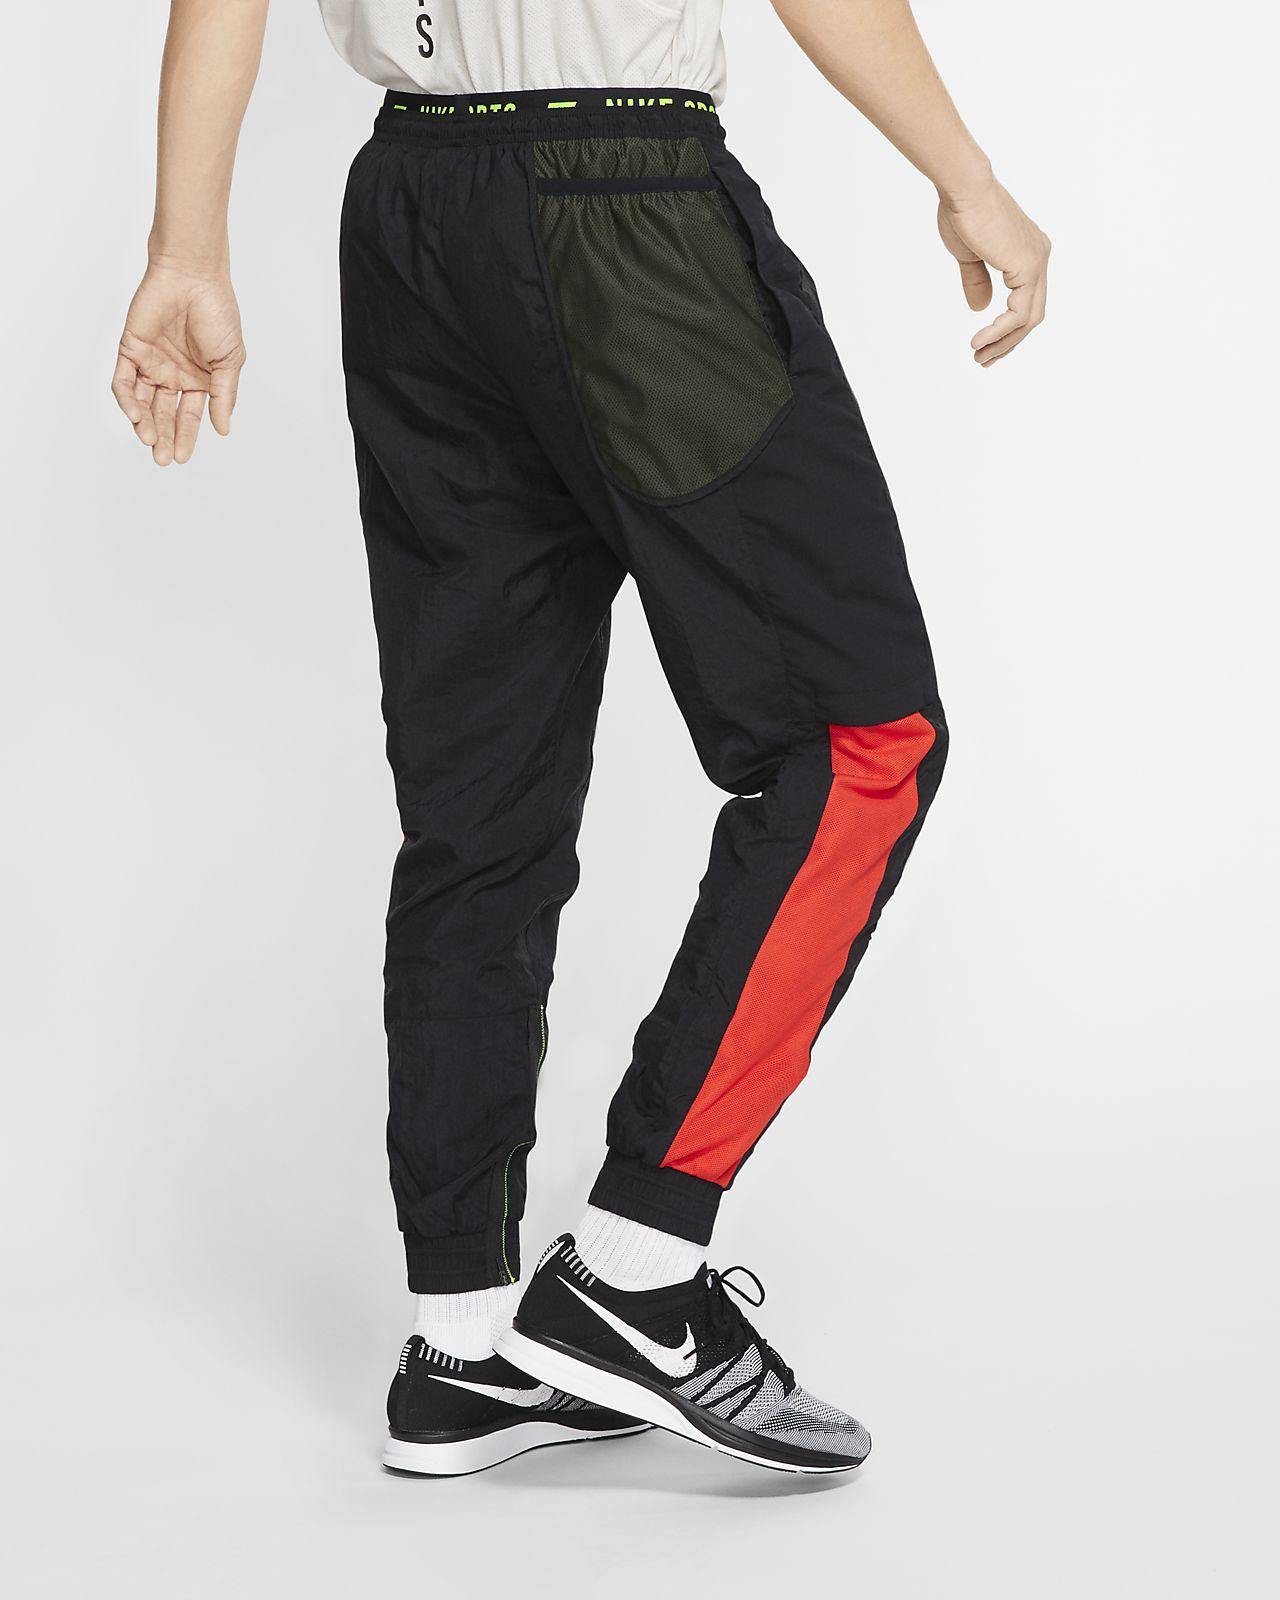 Nike Dri FIT Flex Sport Clash Herren Trainingshose